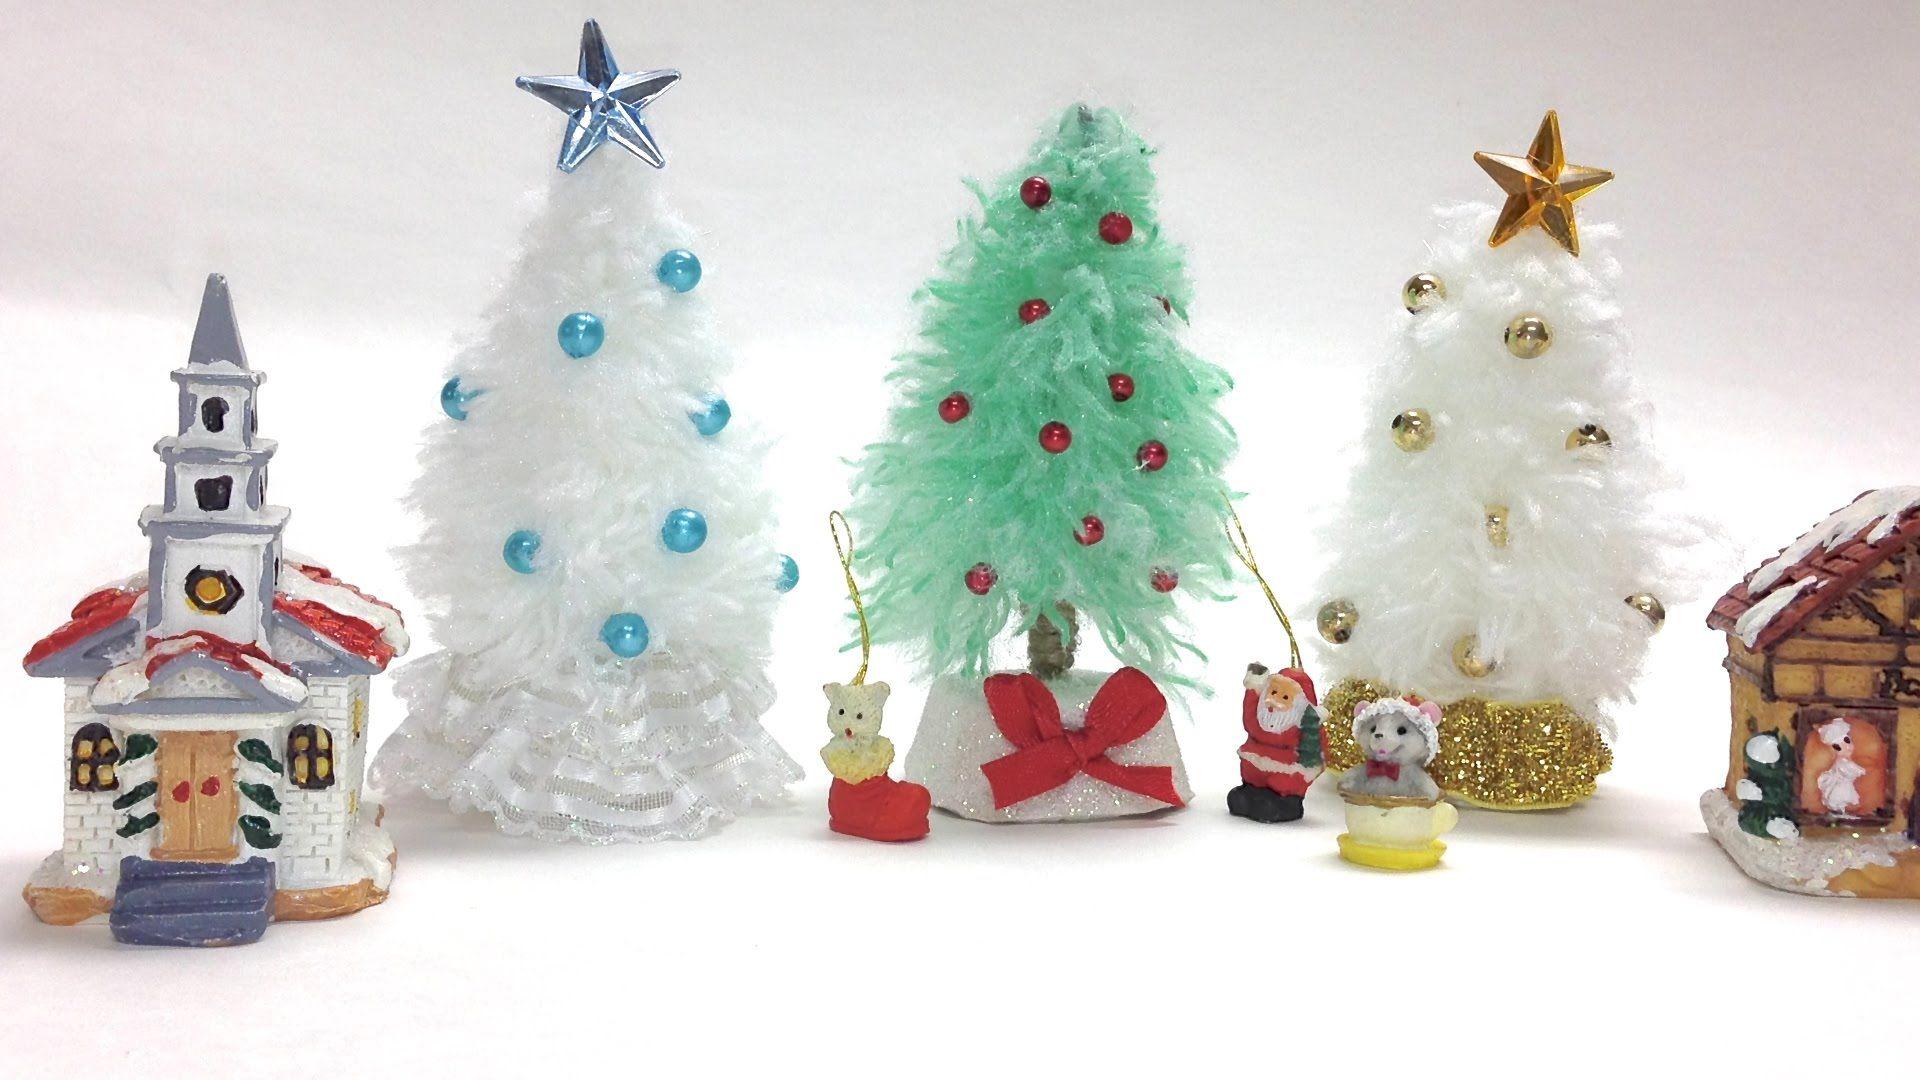 Como Hacer Arboles De Navidad Mini Mini Arbol De Navidad Arboles De Navidad De Papel Arbol De Navidad